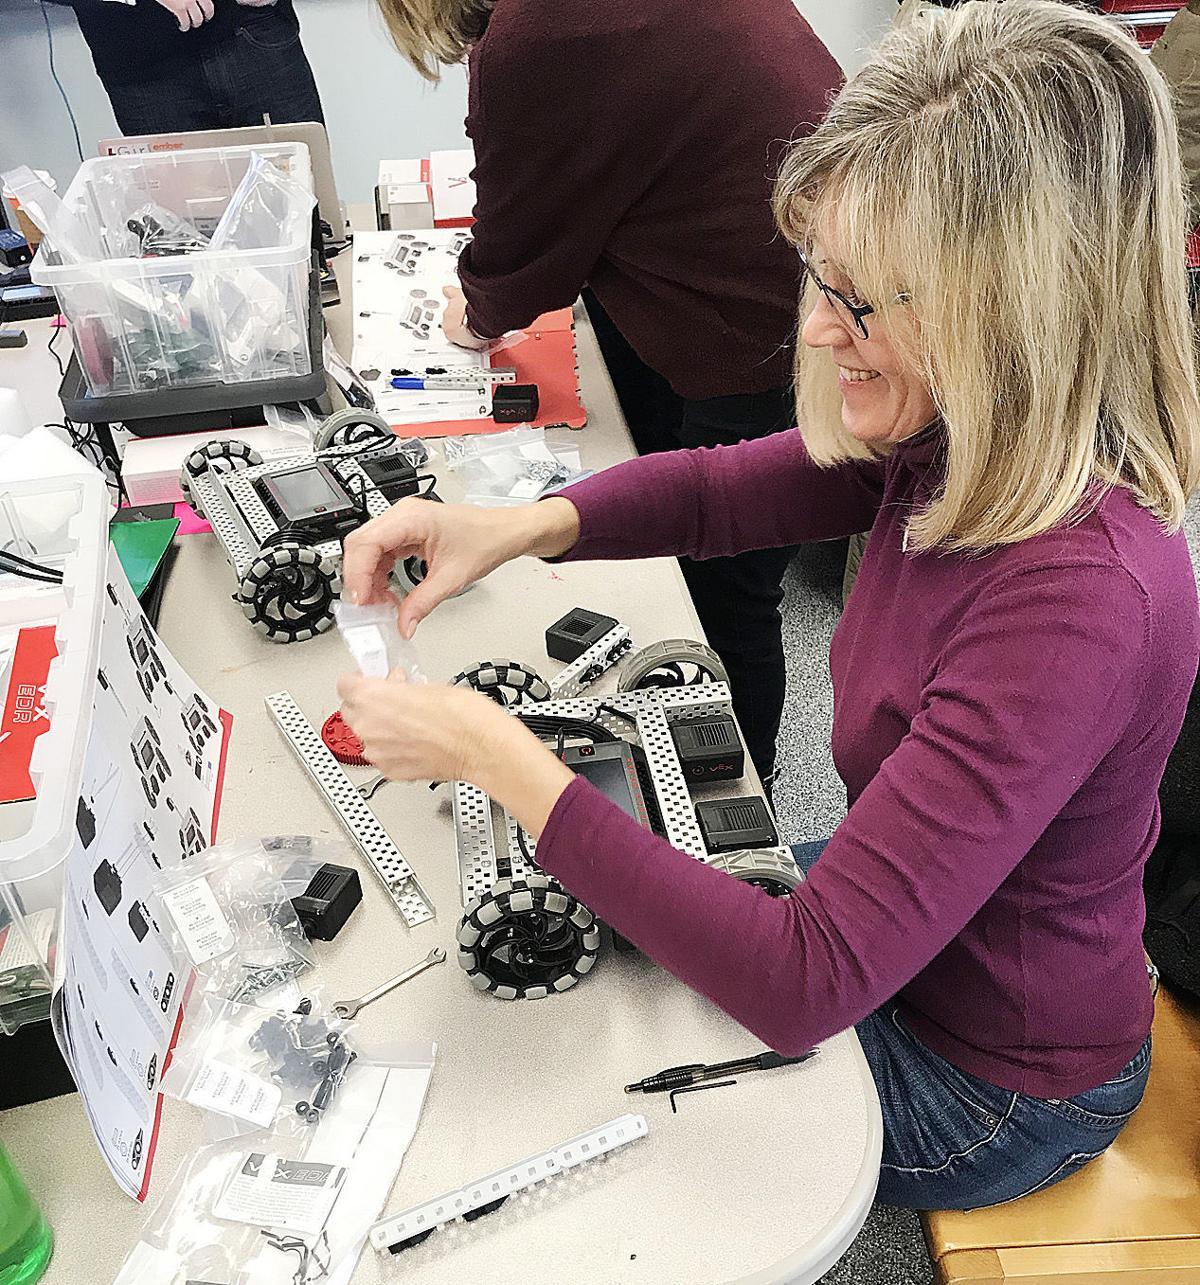 Robotics Education At Mashpee Middle/High School